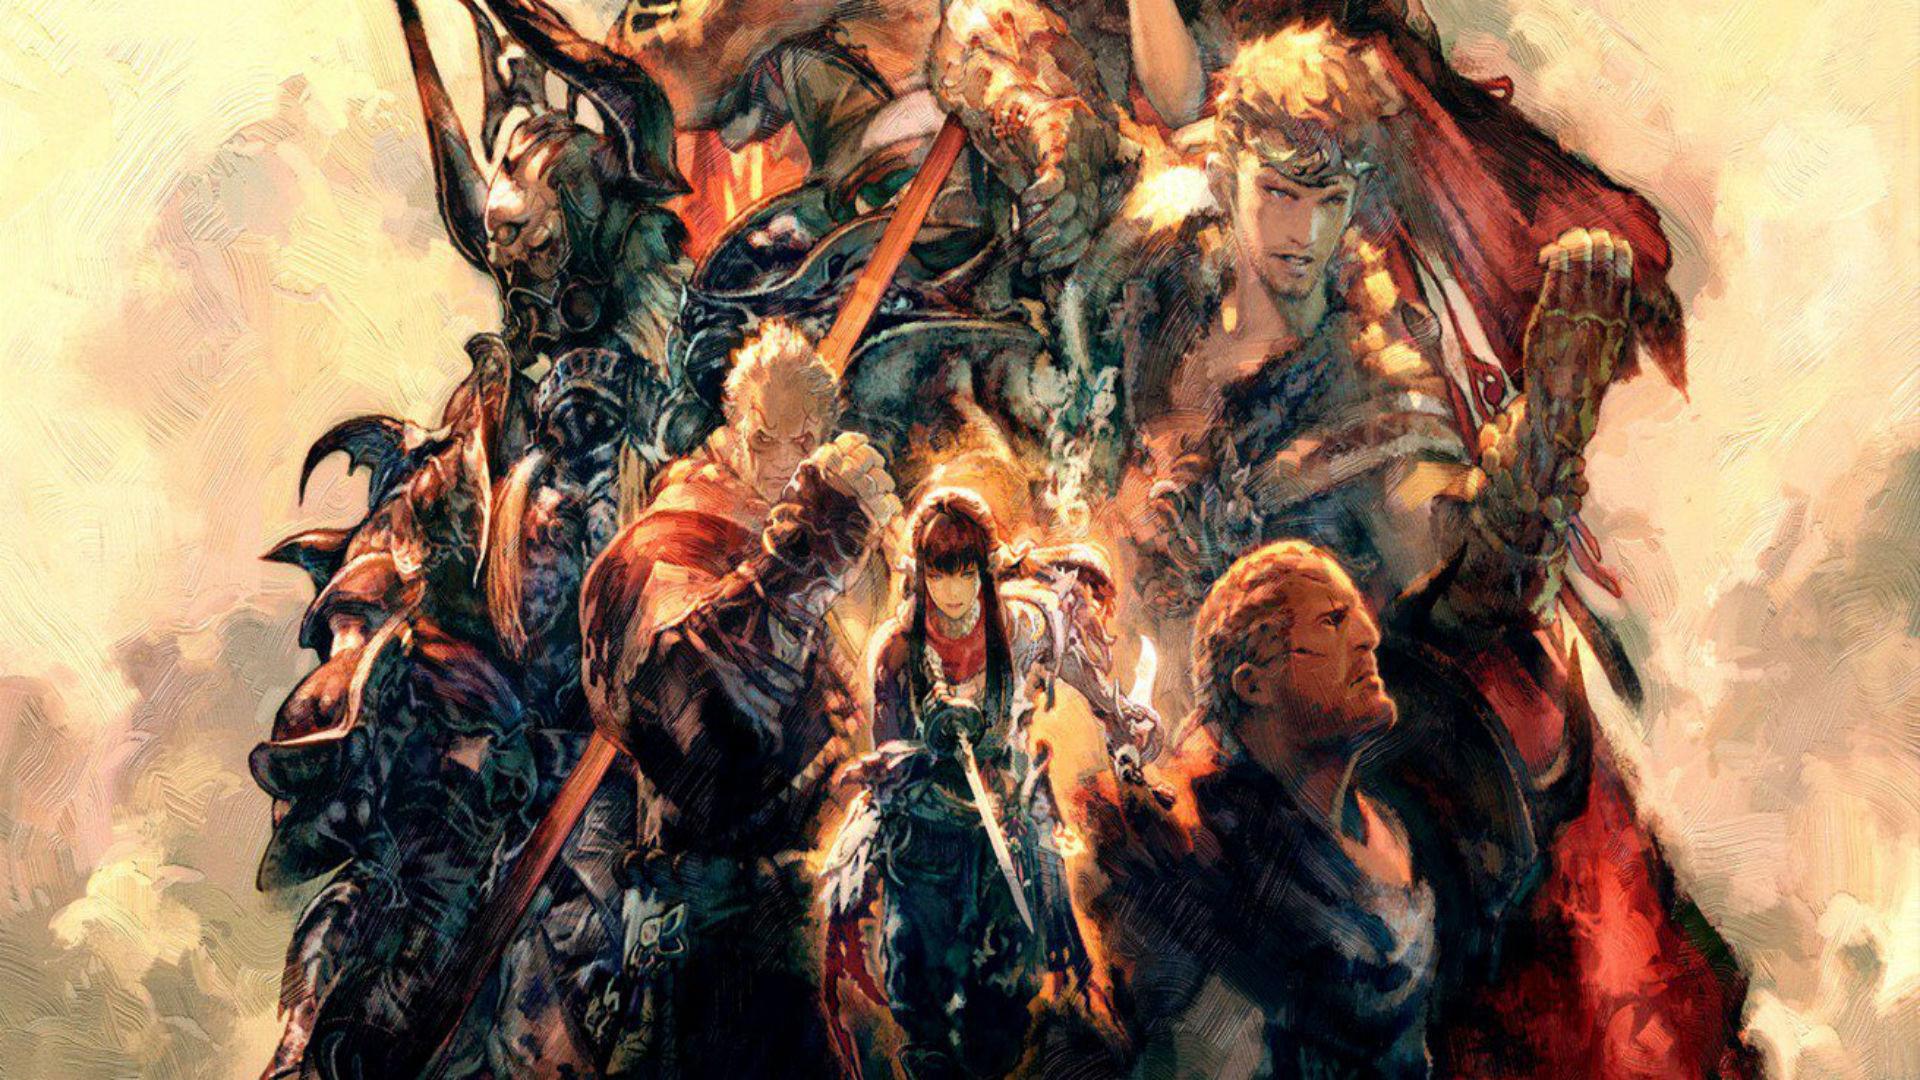 Final Fantasy XIV: Stormblood's opening movie reveals new Samurai class